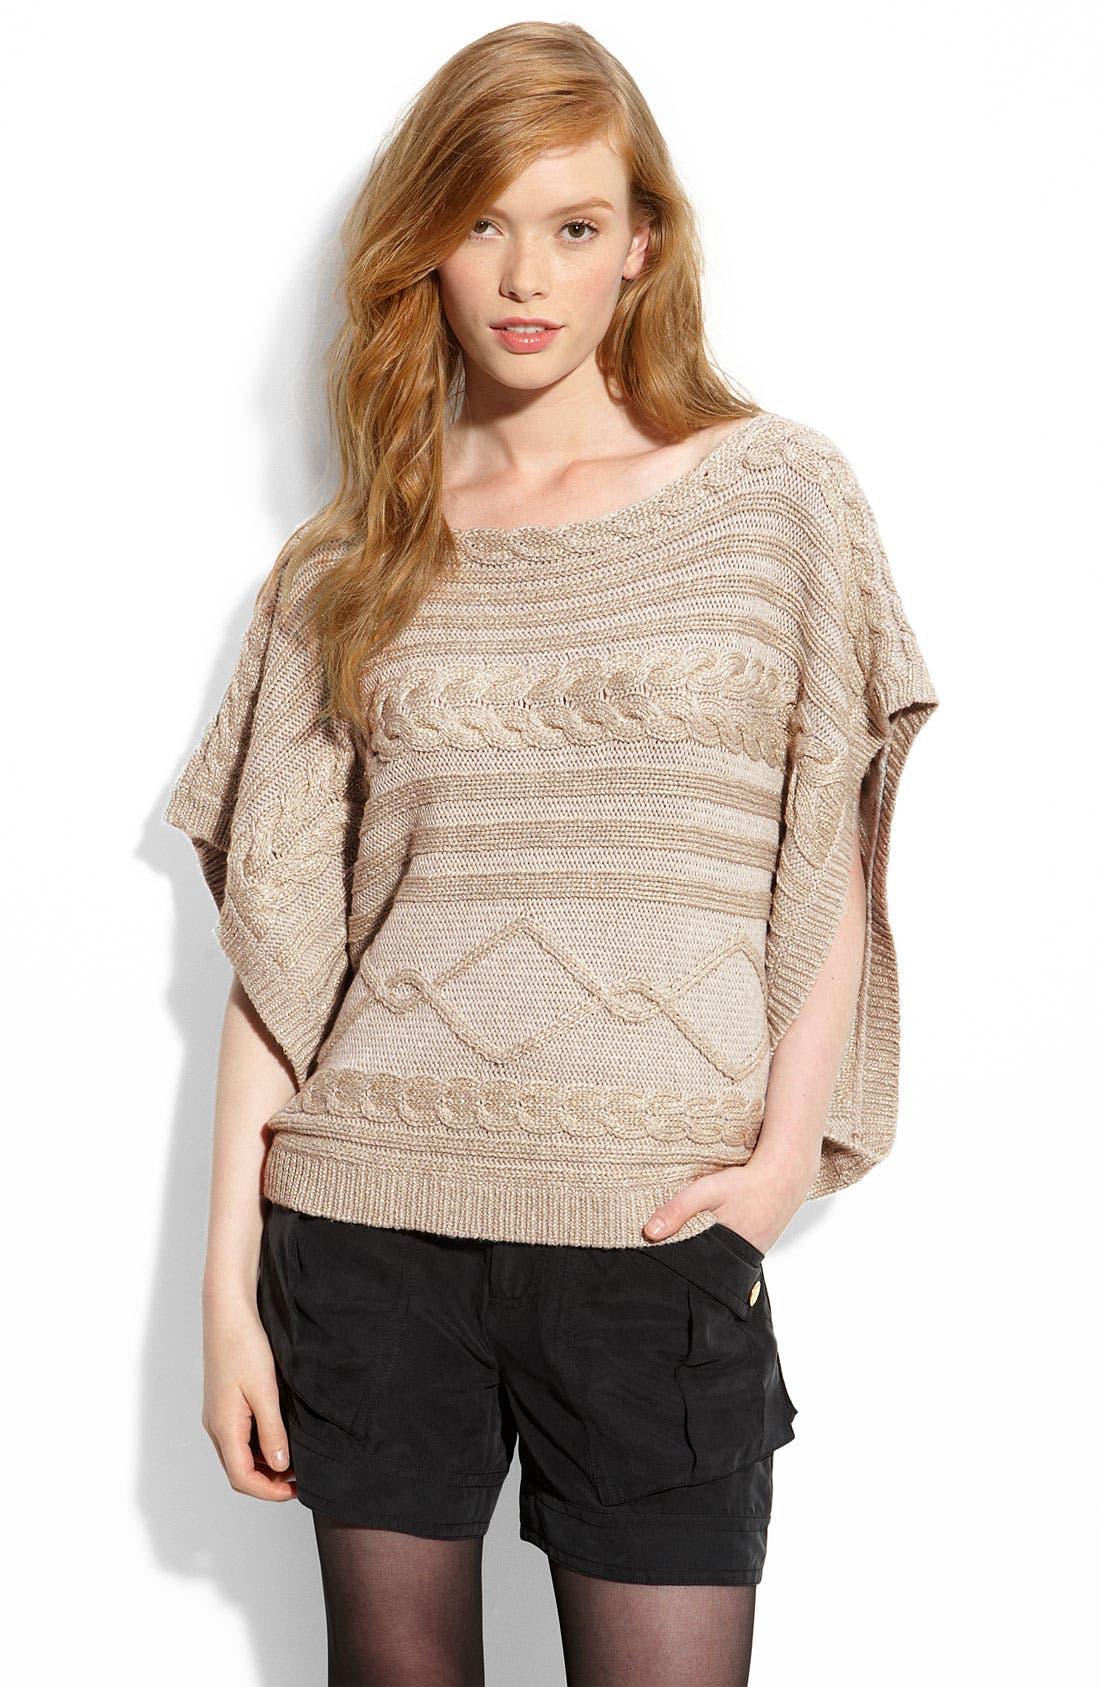 Main Image - LaROK 'Jillian' Metallic Sweater Knit Poncho